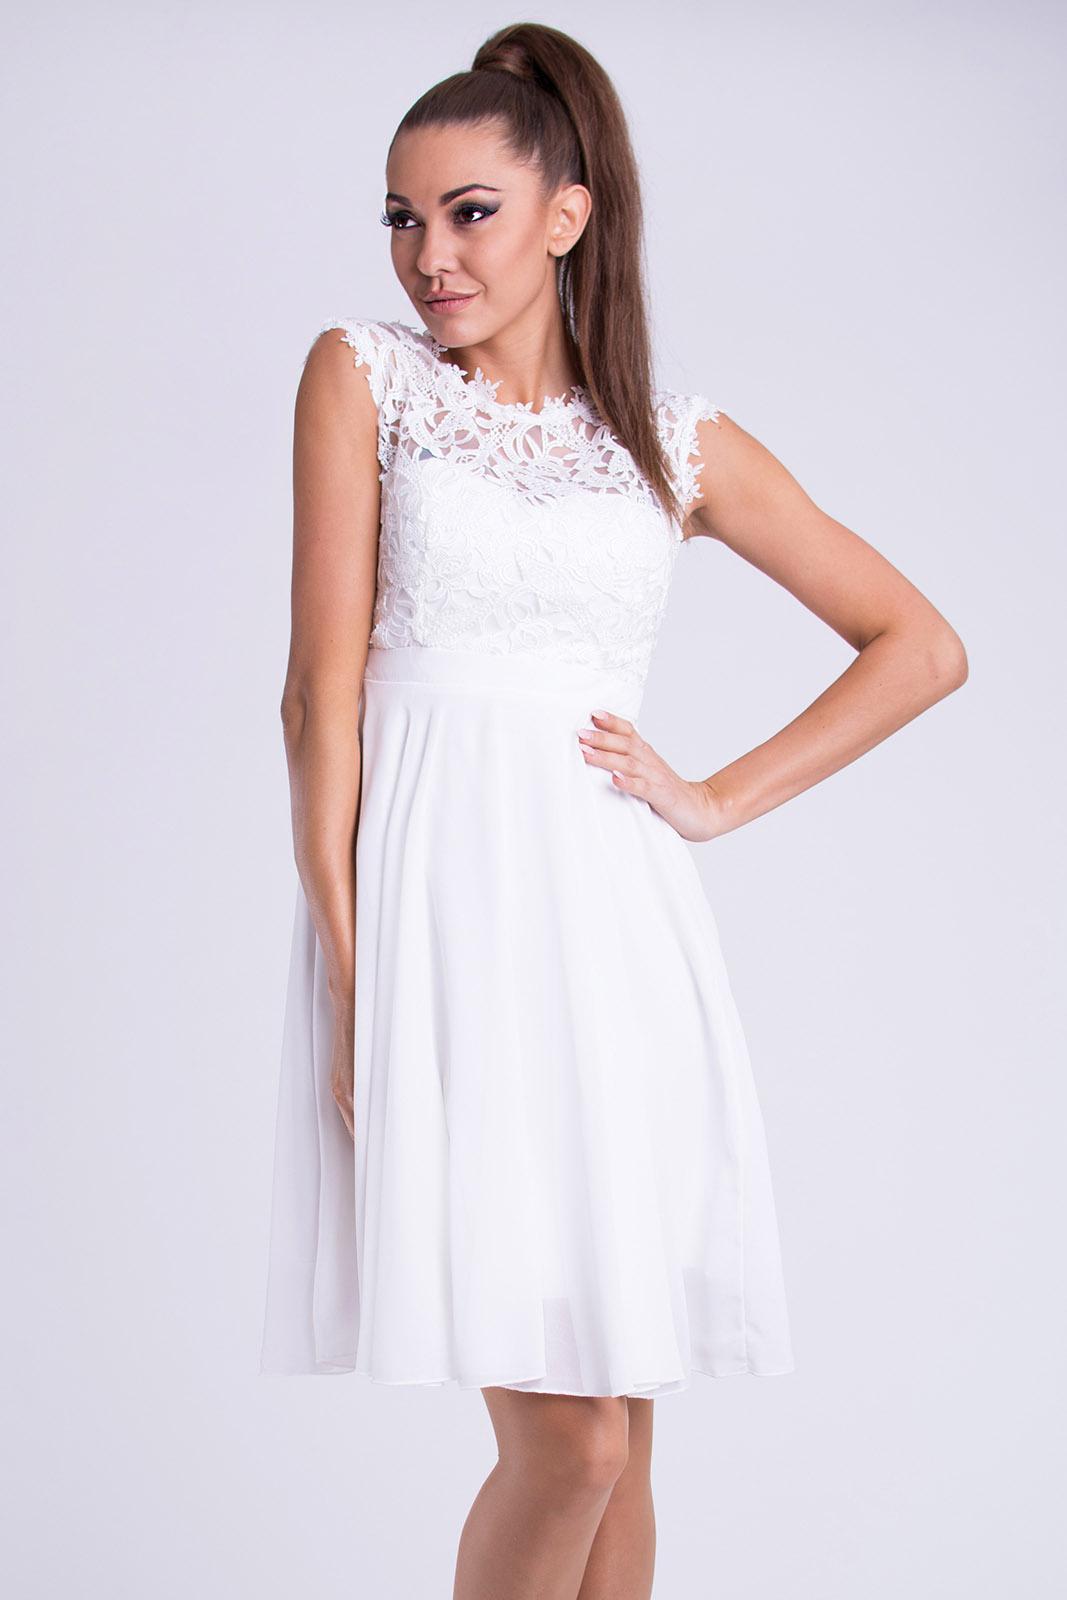 405df2ec5cc8 Dámské společenské šaty Maëlys s krajkou bílá